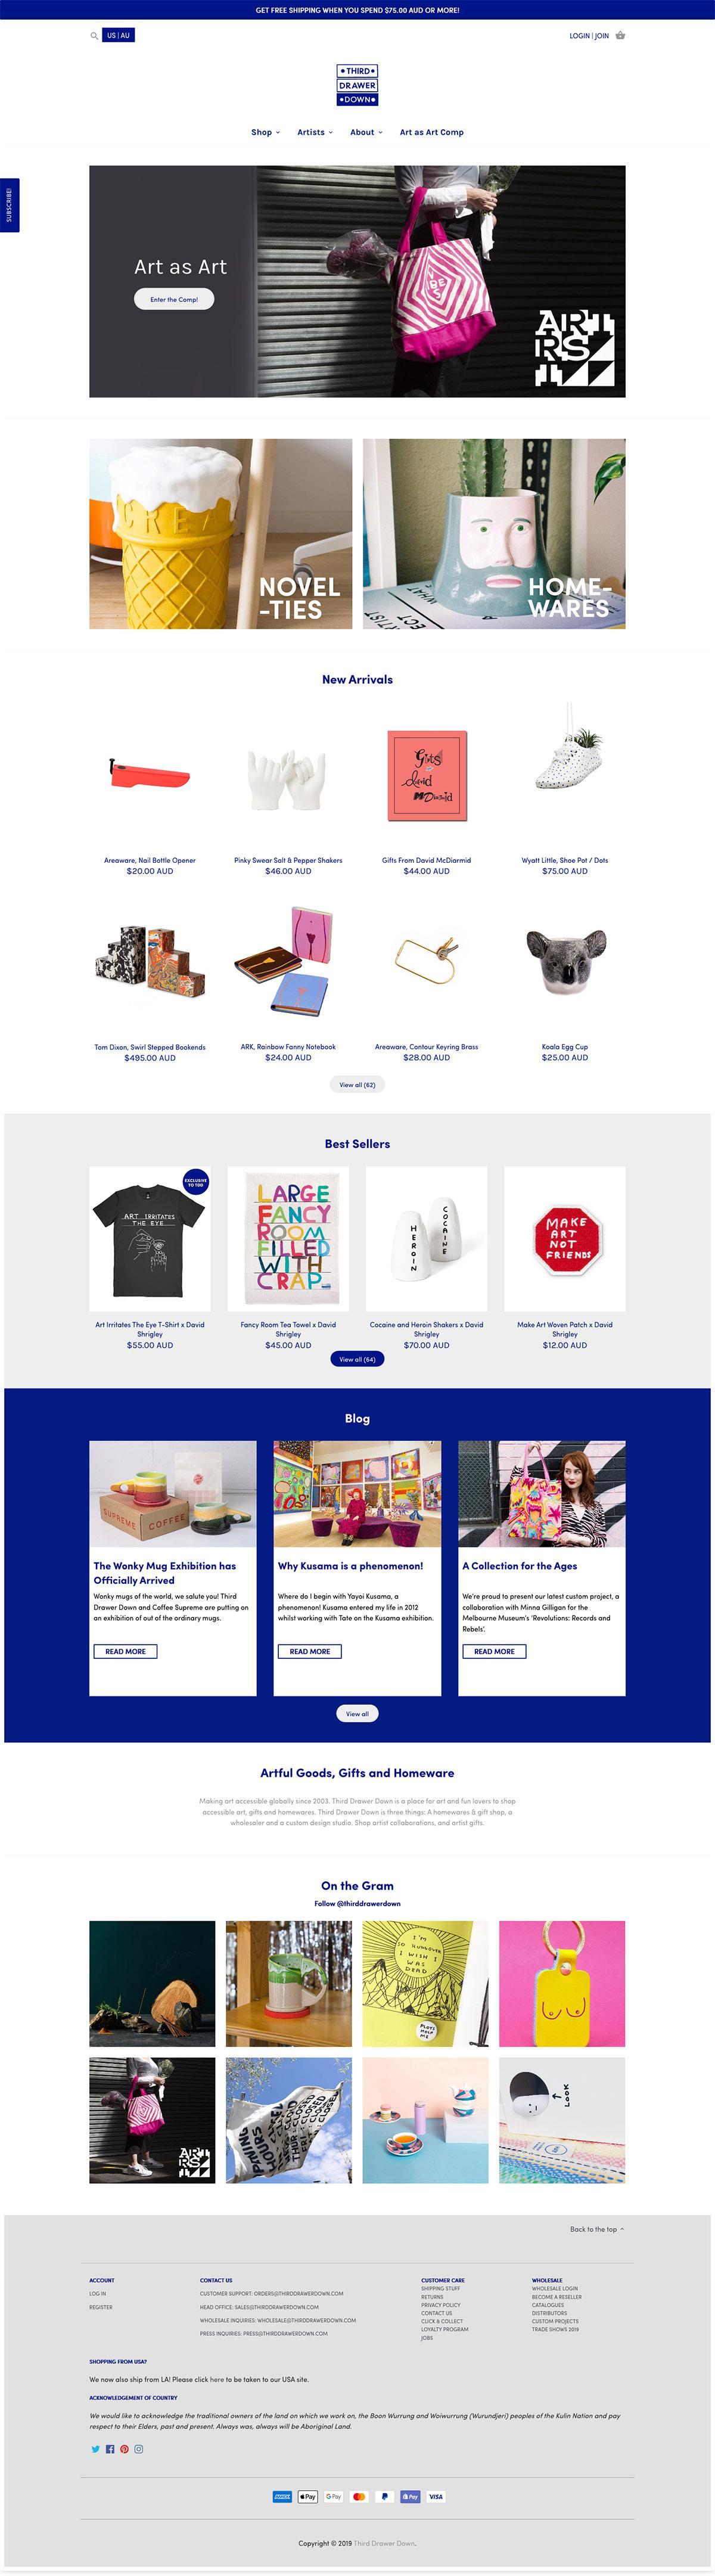 eCommerce website: Third Drawer Down